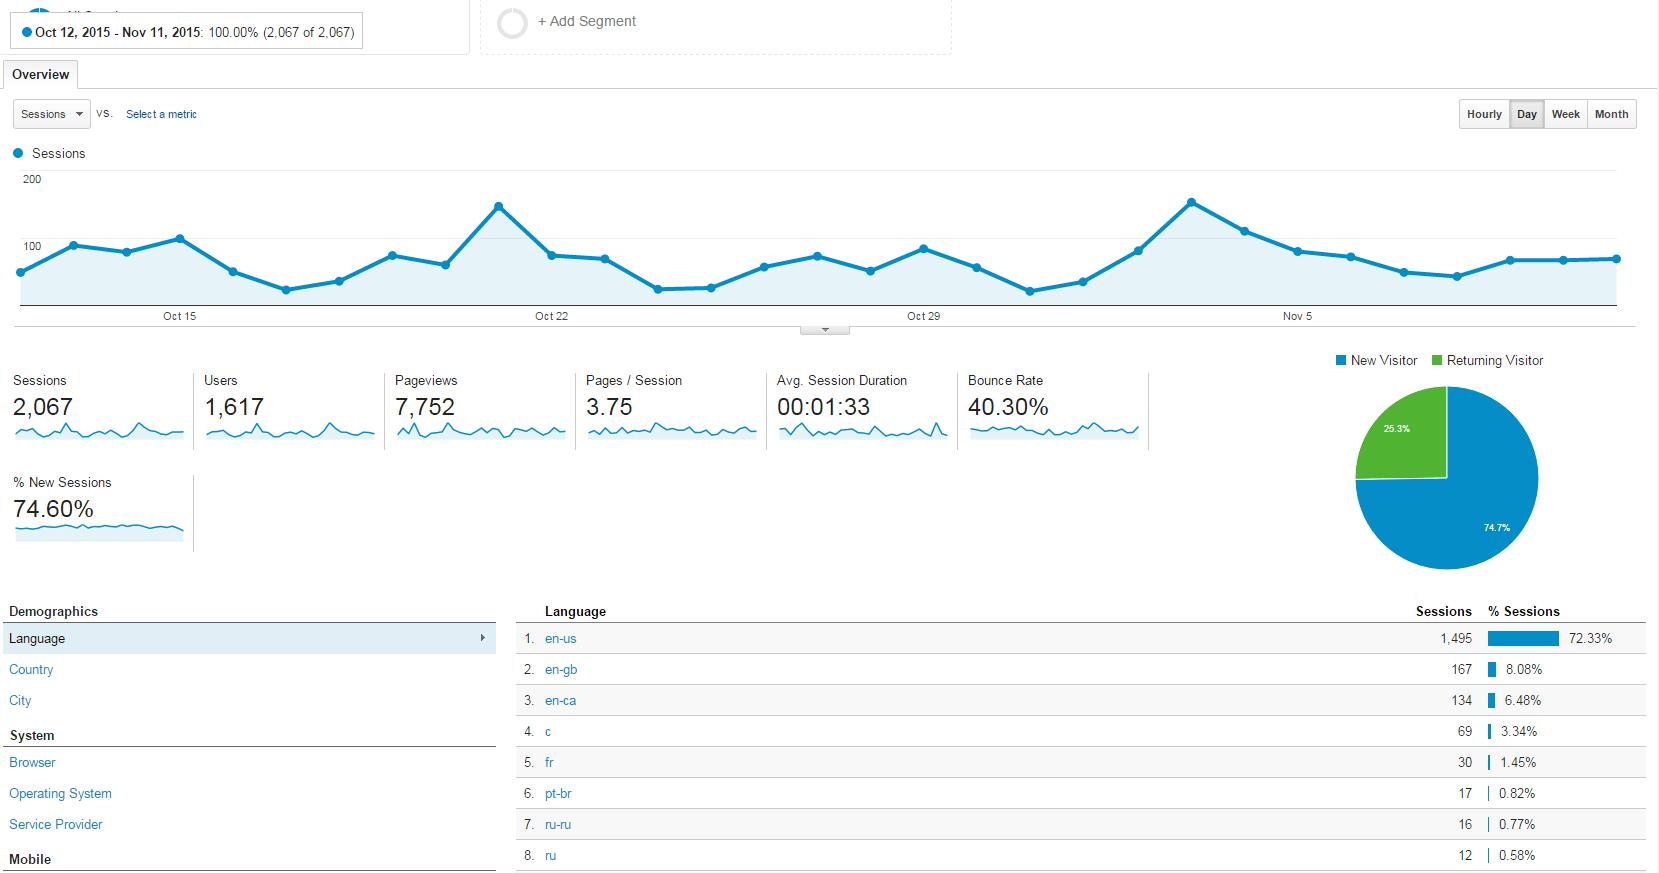 Top Marketing Apps - Google Analytics